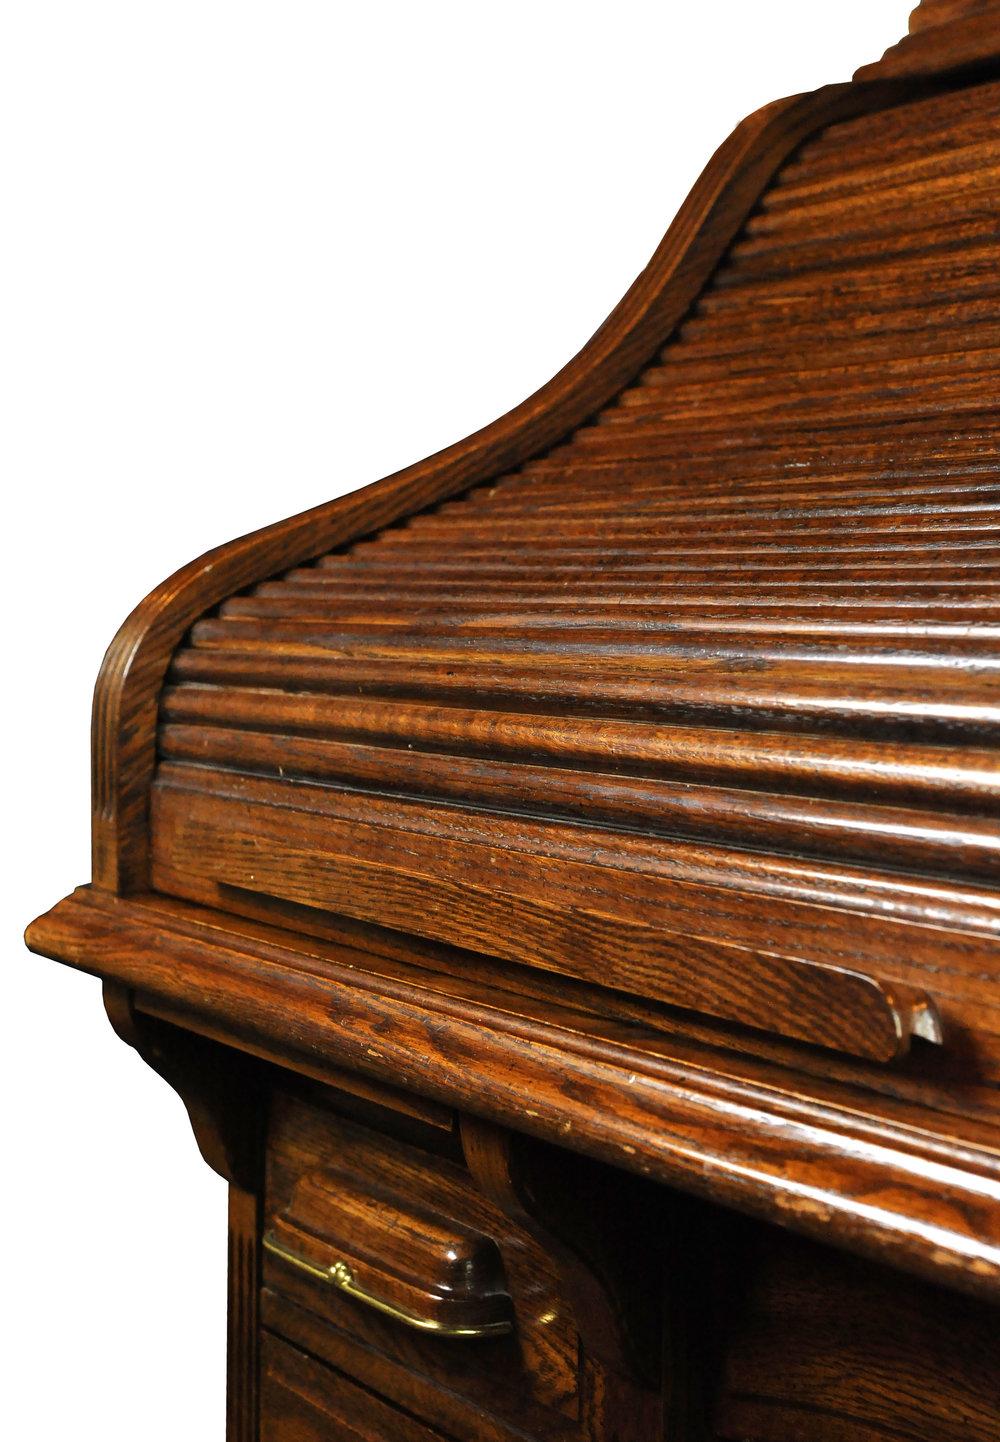 47117-rolltop-desk-wood-cover-detail.jpg